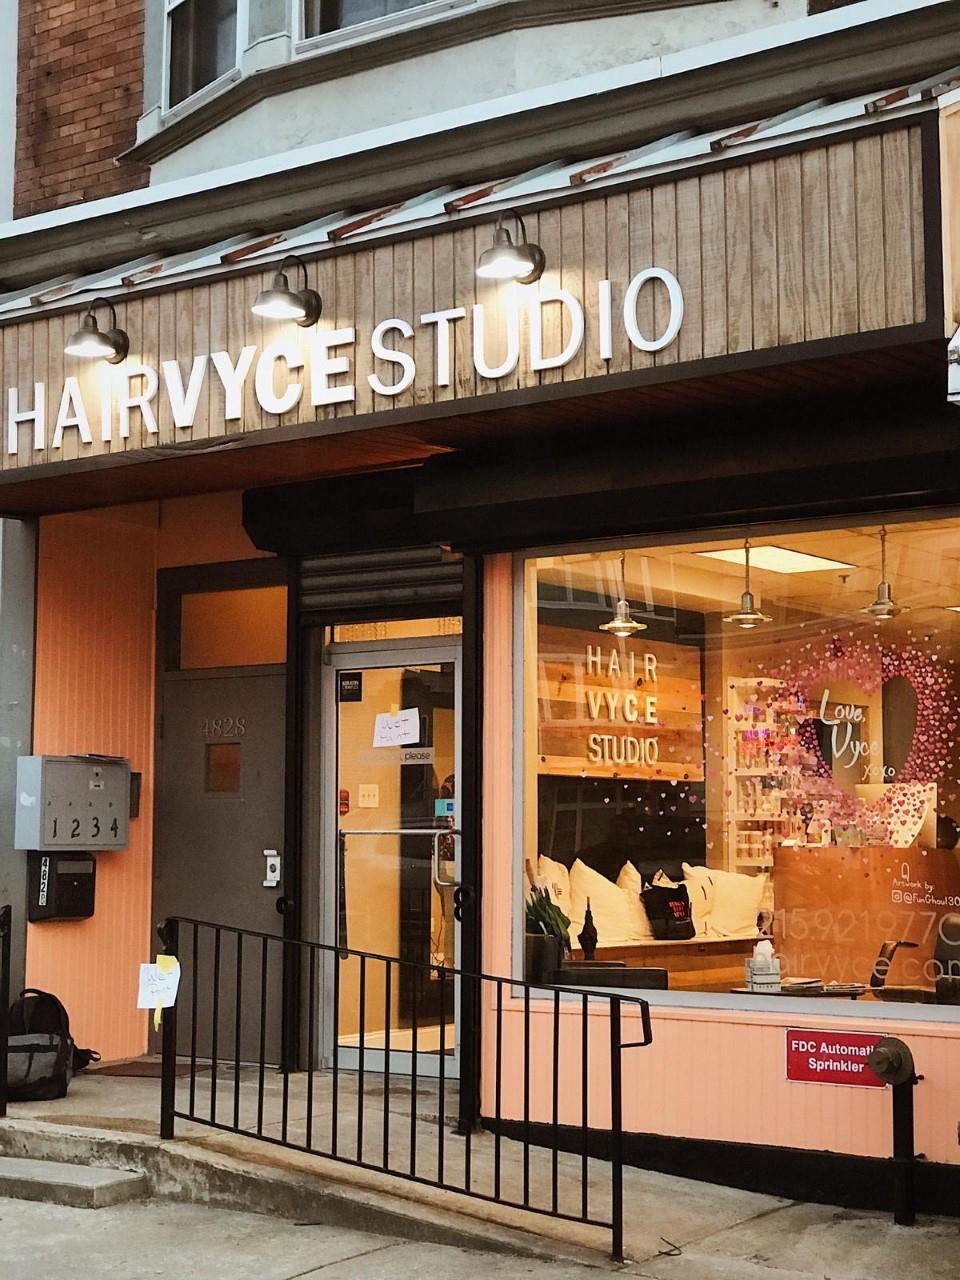 Hair Vyce Studio exteror